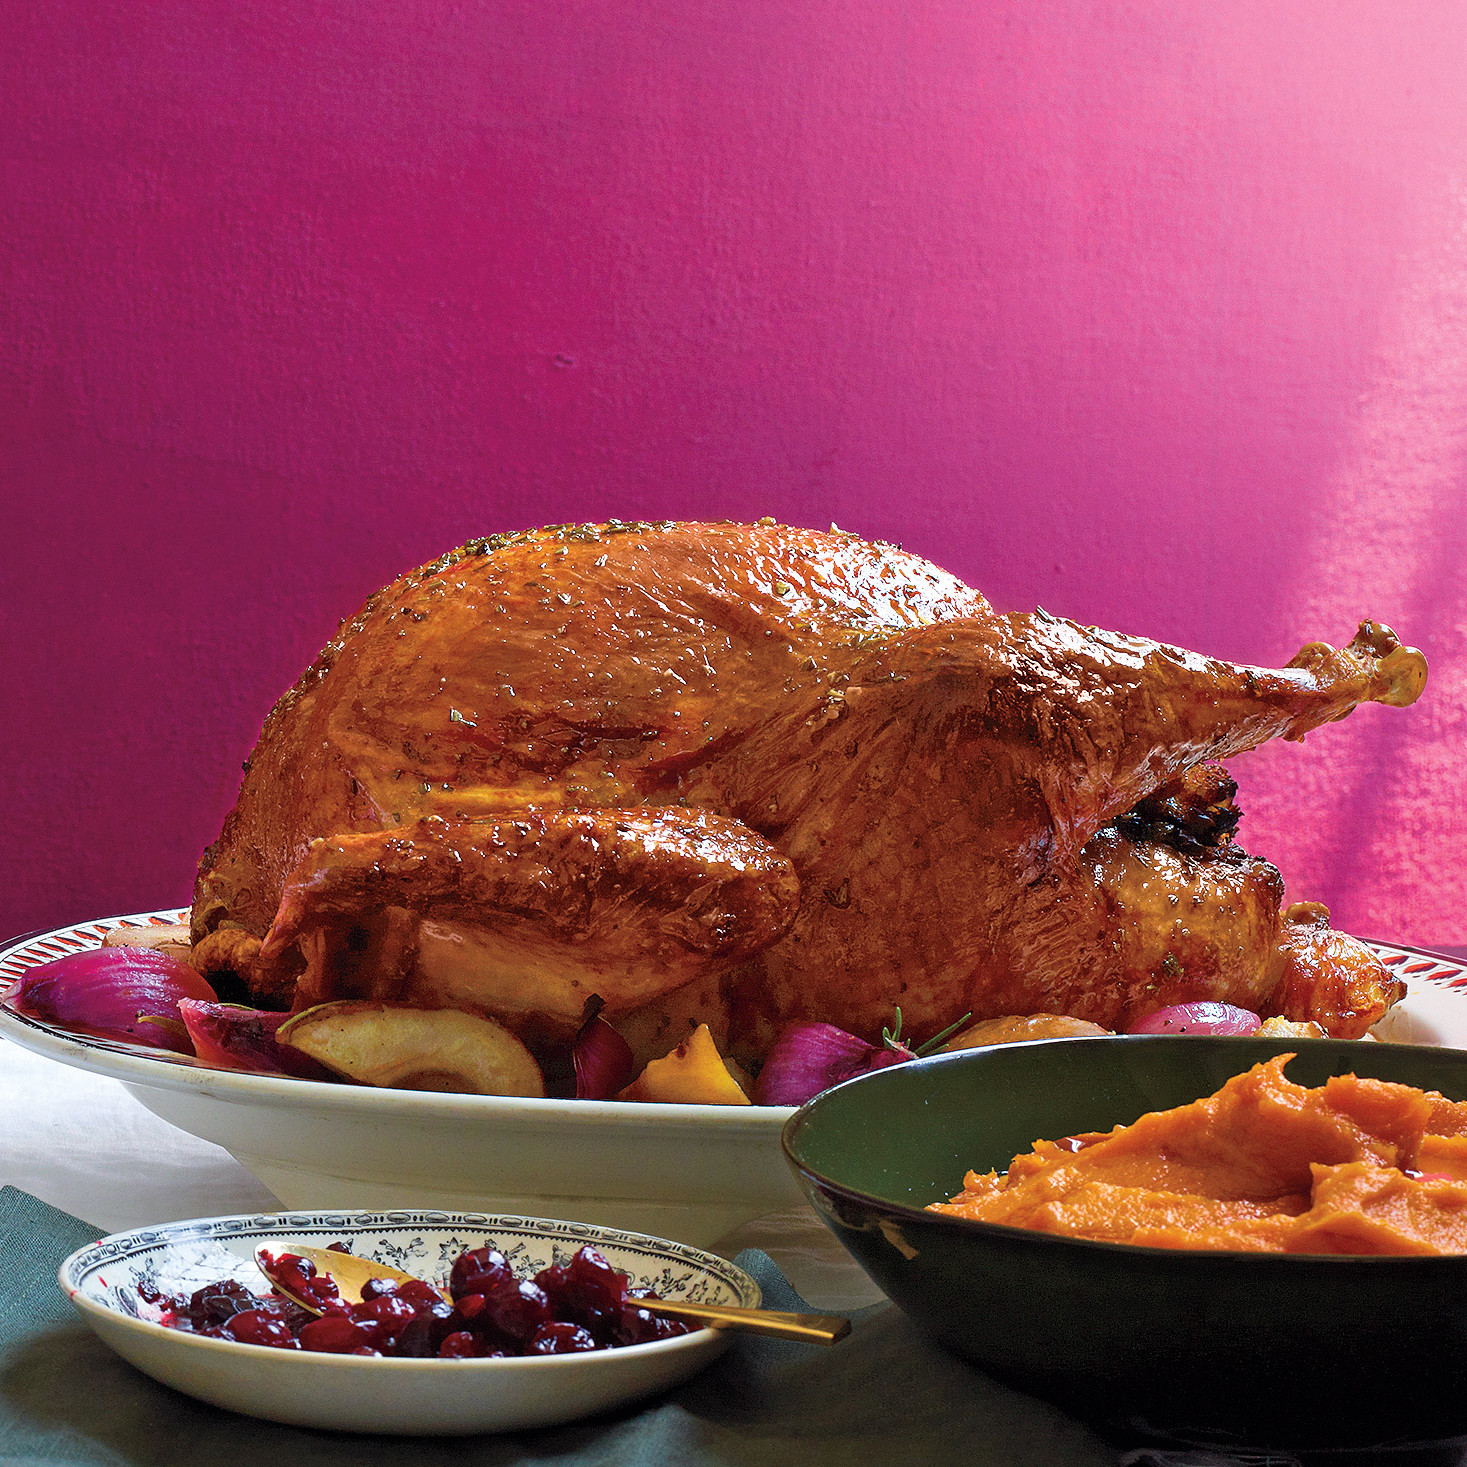 Roast Turkey With Rosemary And Lemon